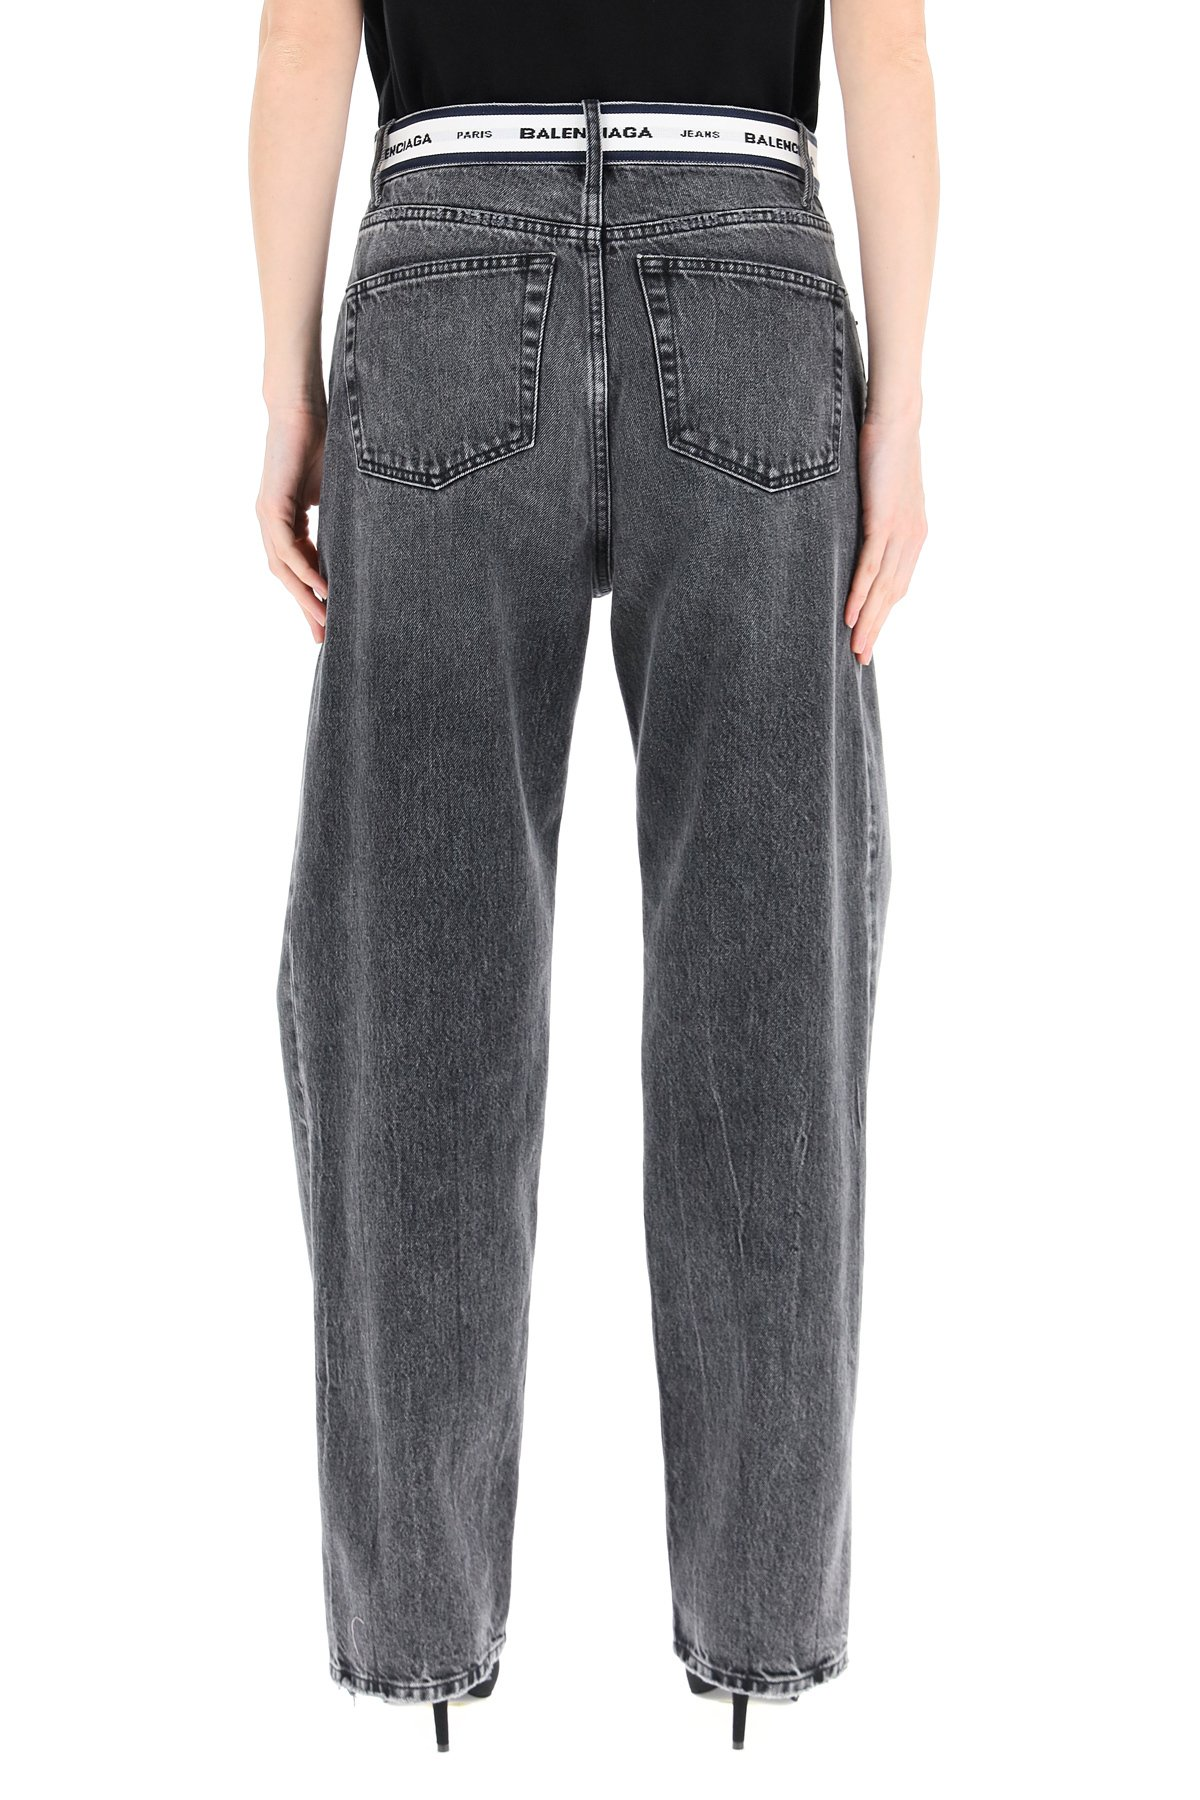 Balenciaga jeans con nastro monogram in vita